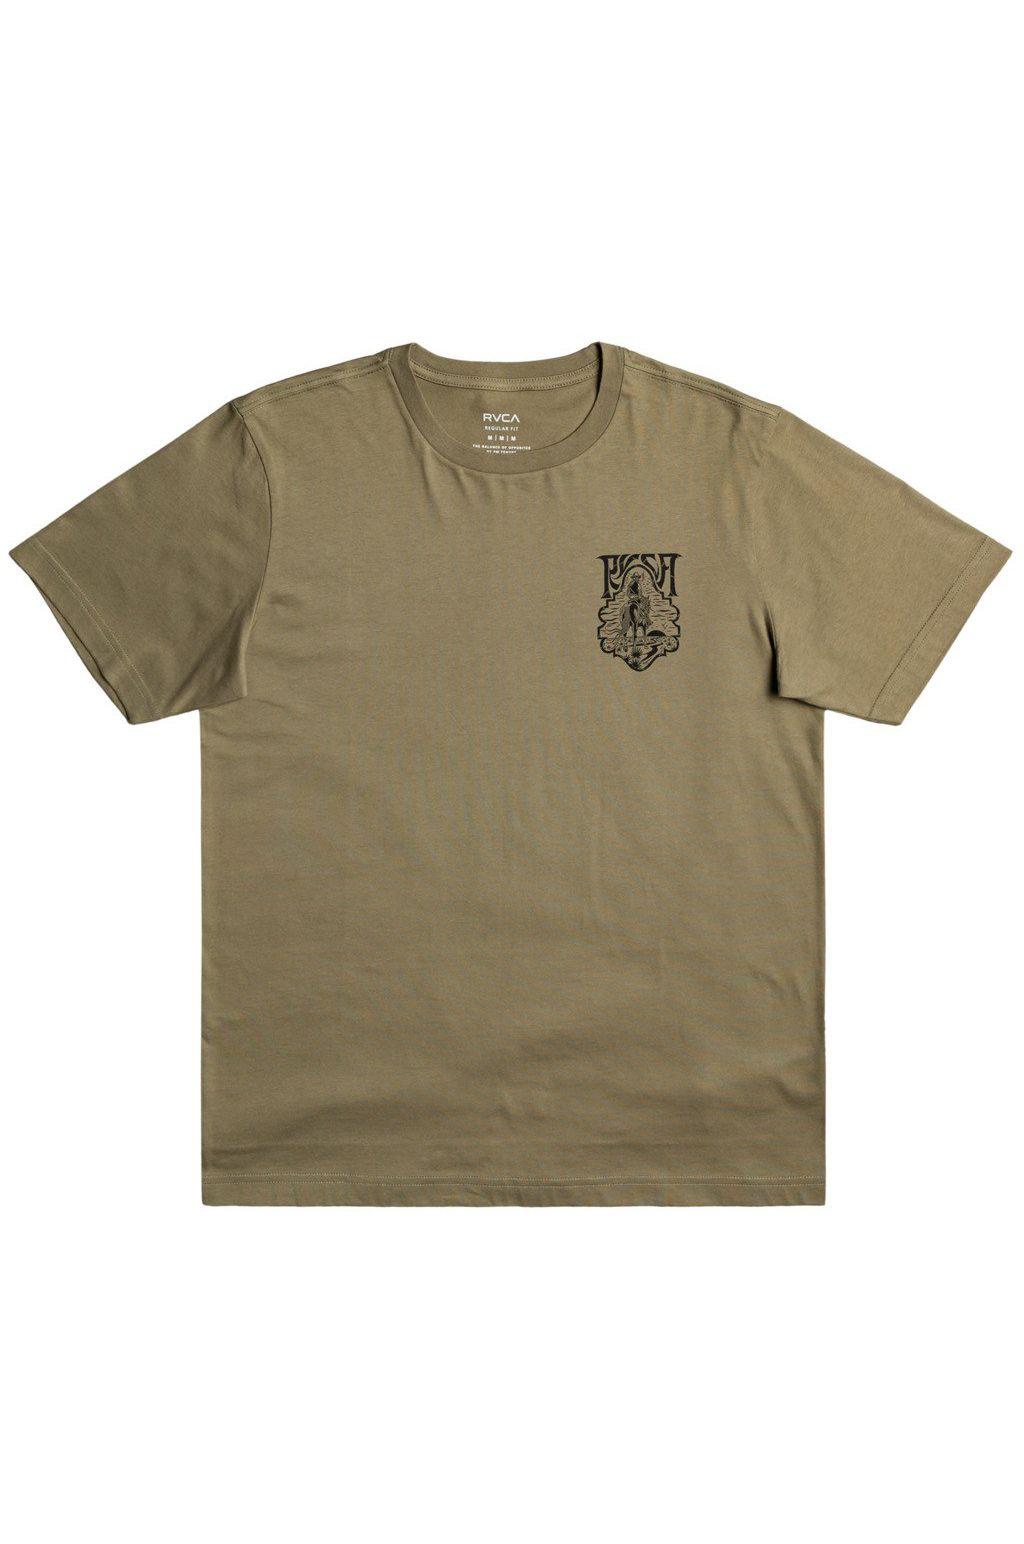 RVCA T-Shirt RANGER ALEX MATUS Cactus